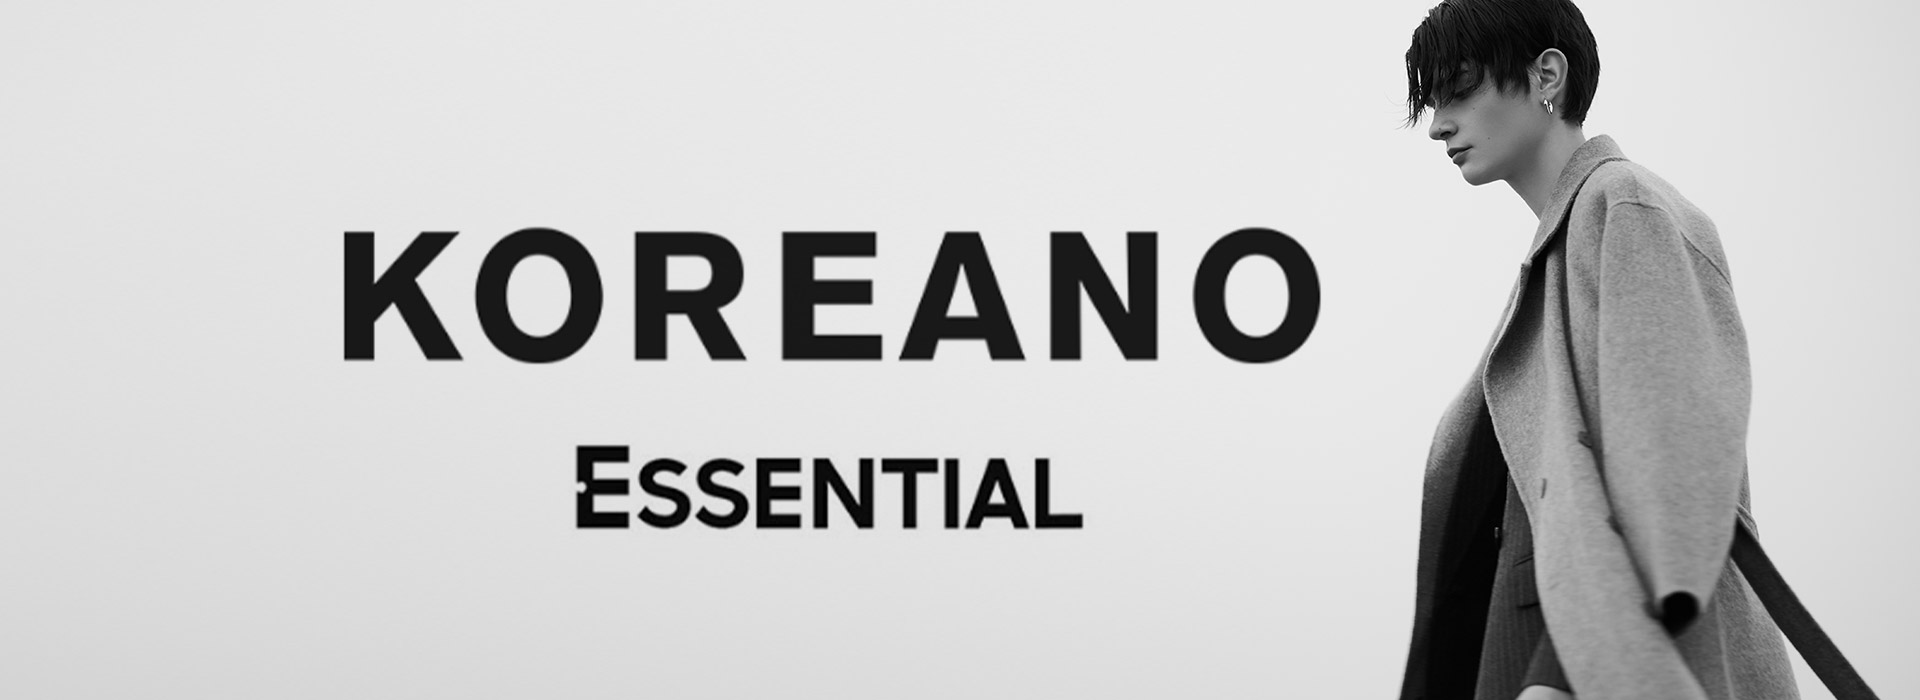 Koreano Essential Banner